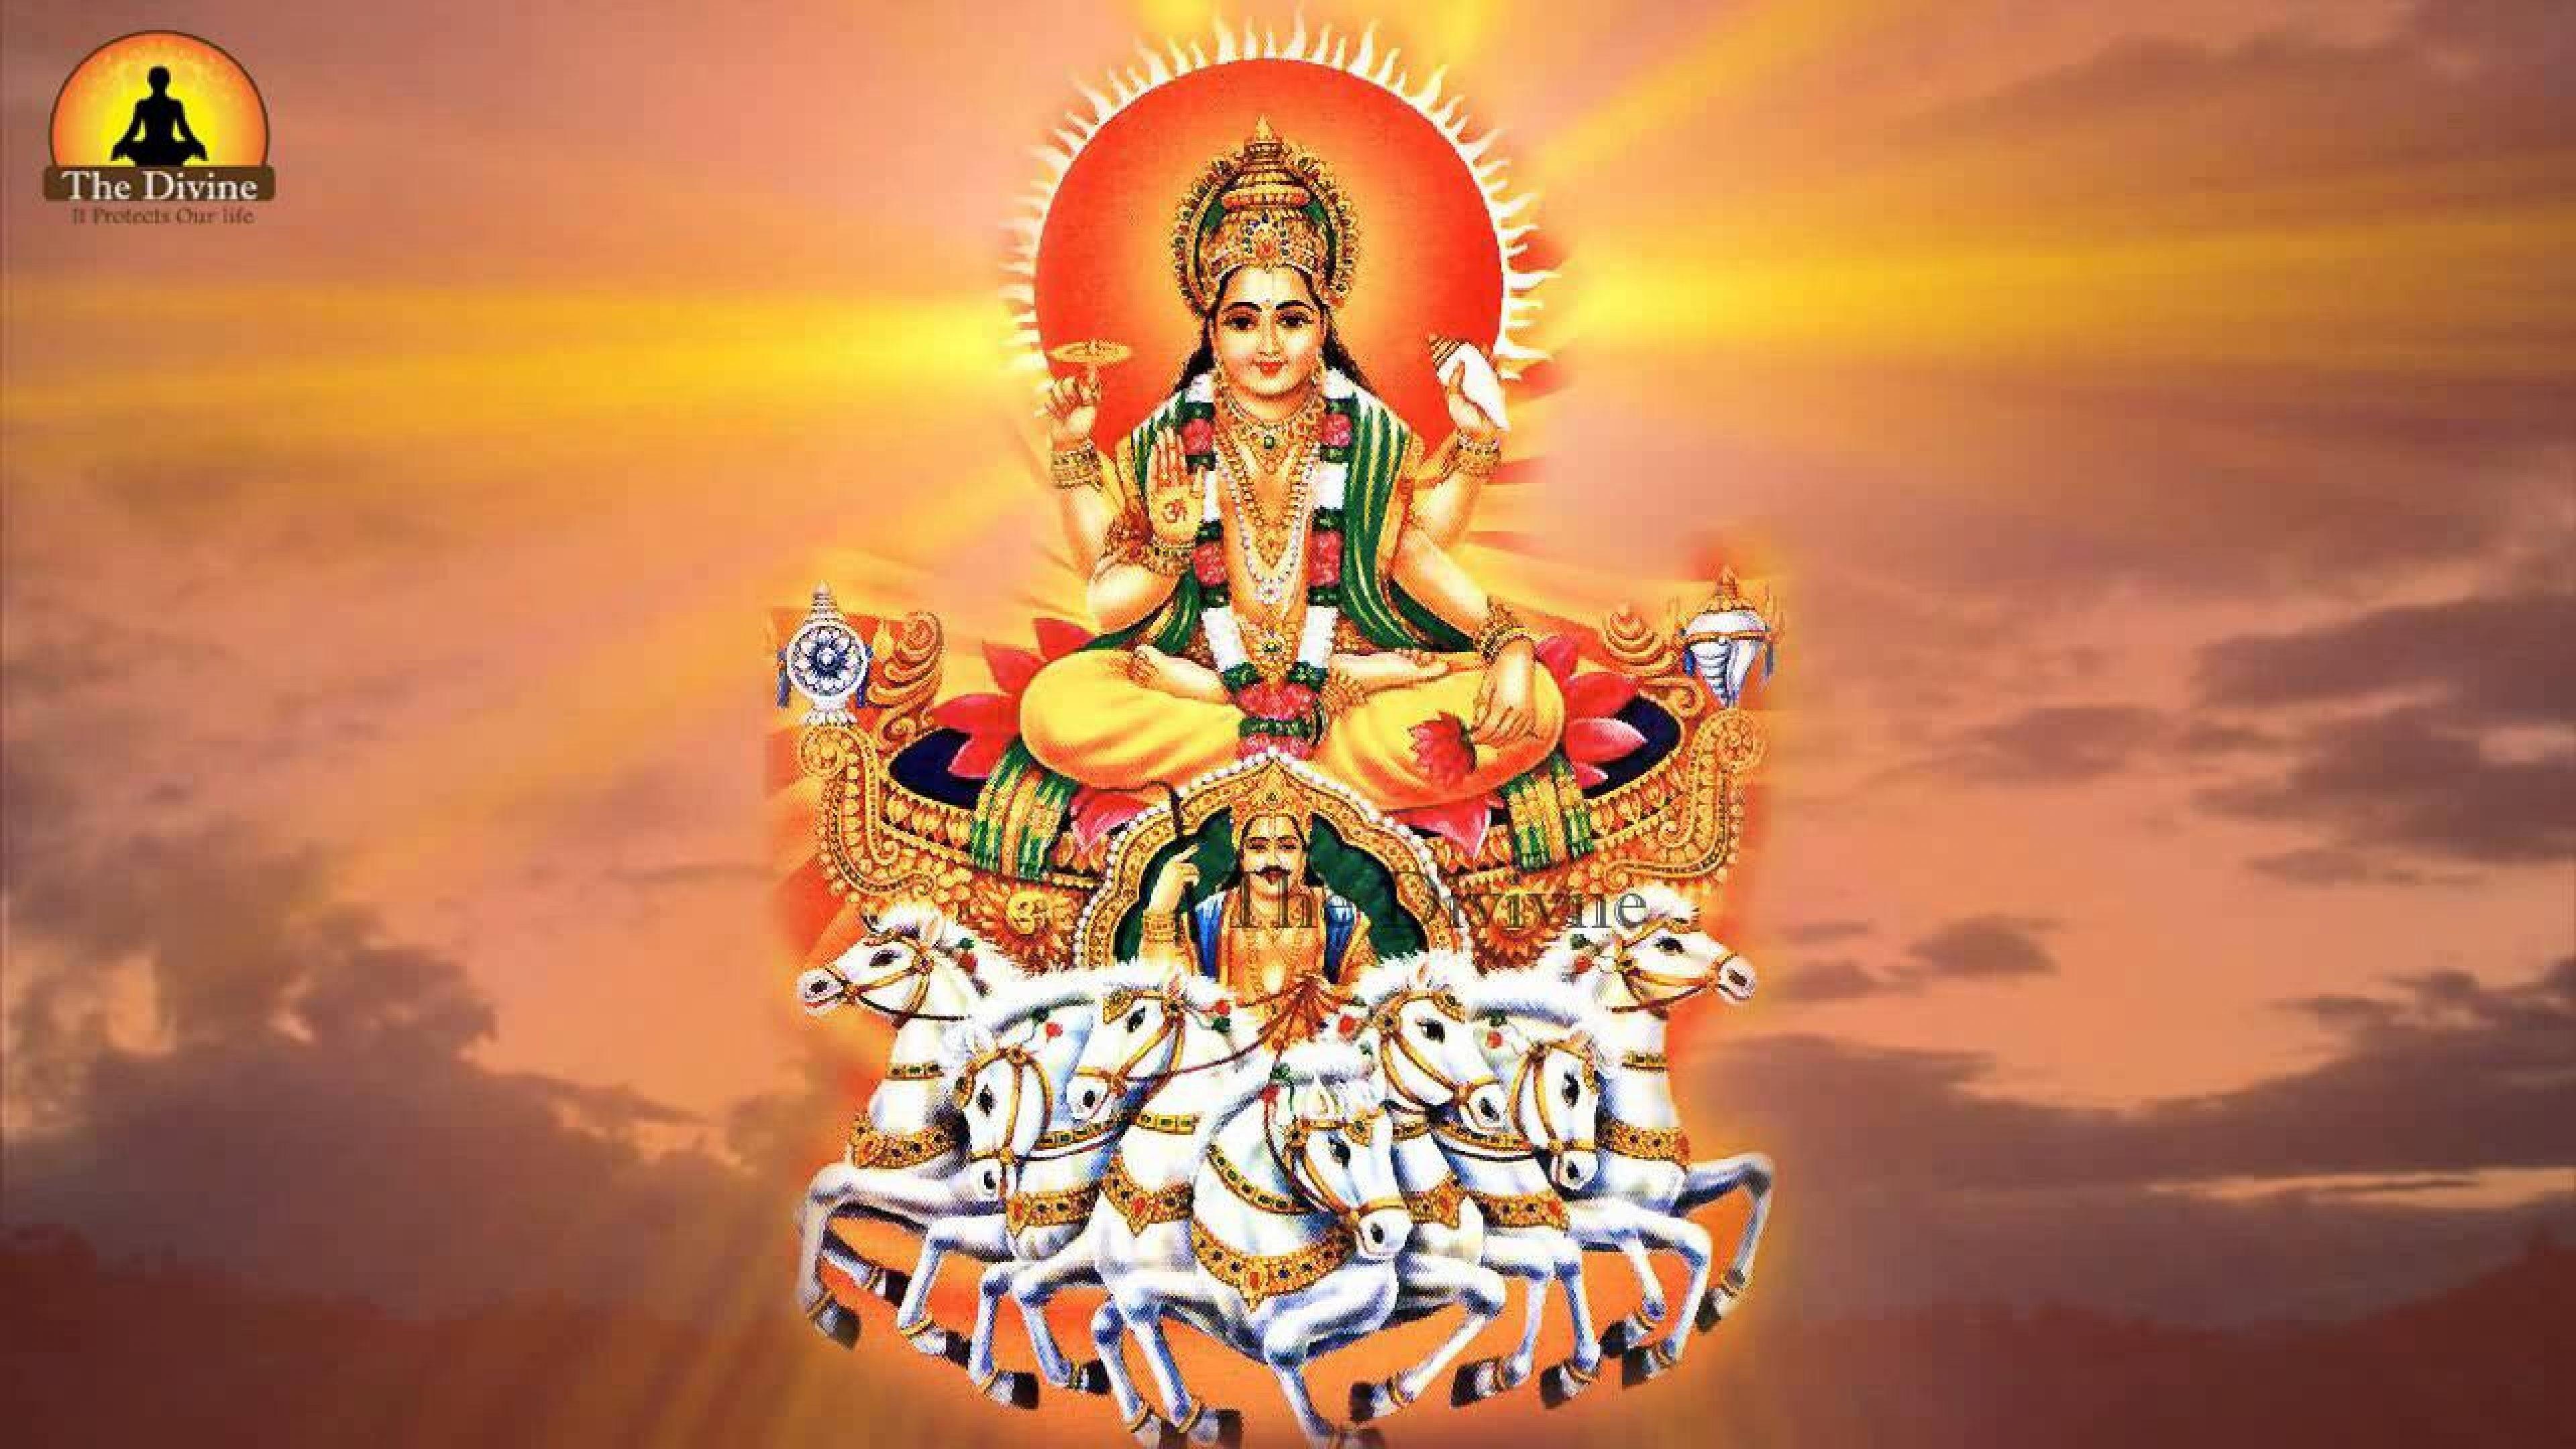 Hindu God Wallpaper Full Hd Wallpaper God Image 51 Images